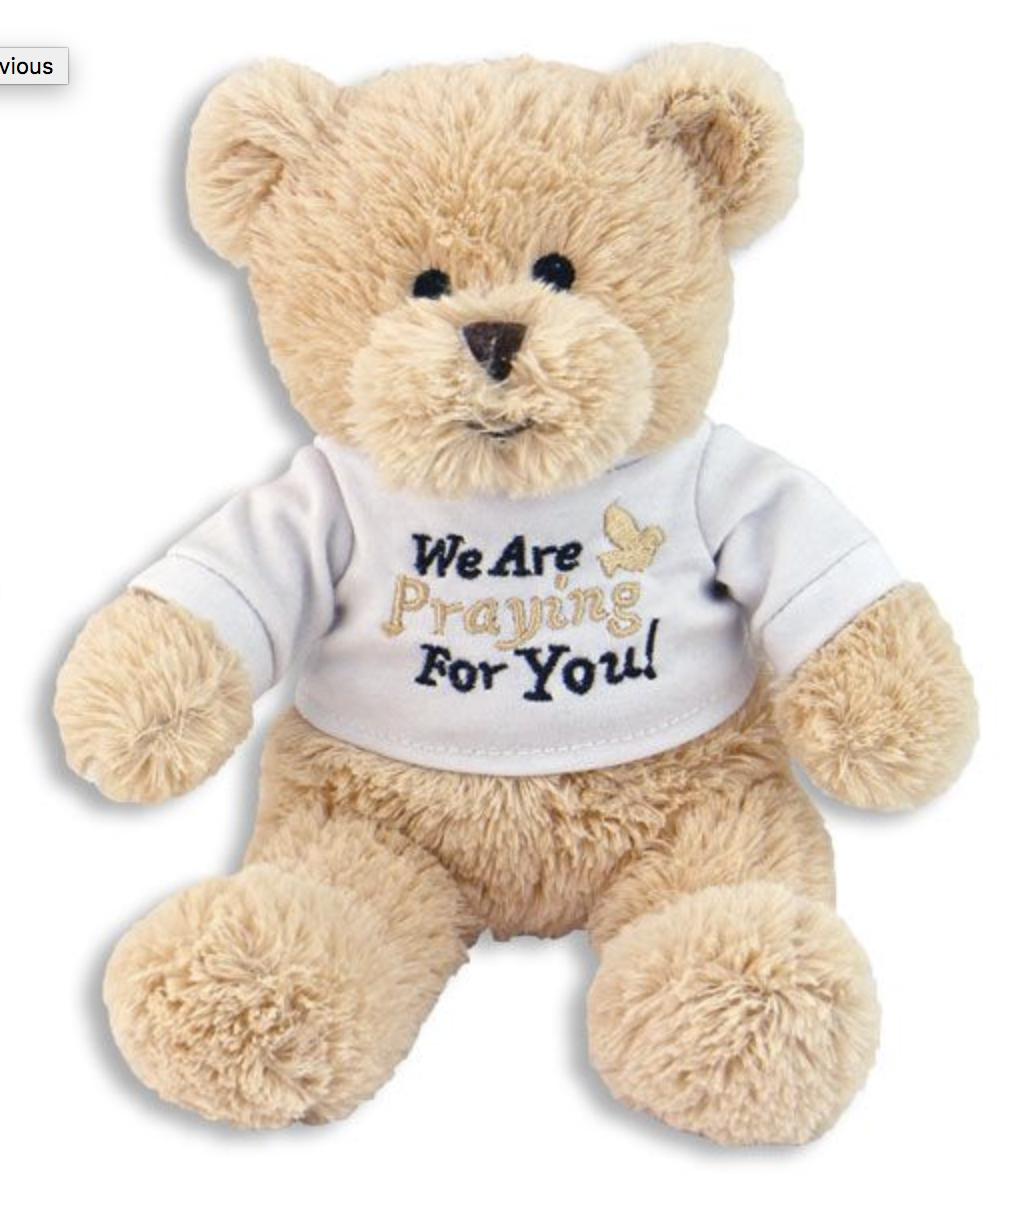 Plush Teddy Bear Cuddly Comforting Cheer Up Child Adult Pray